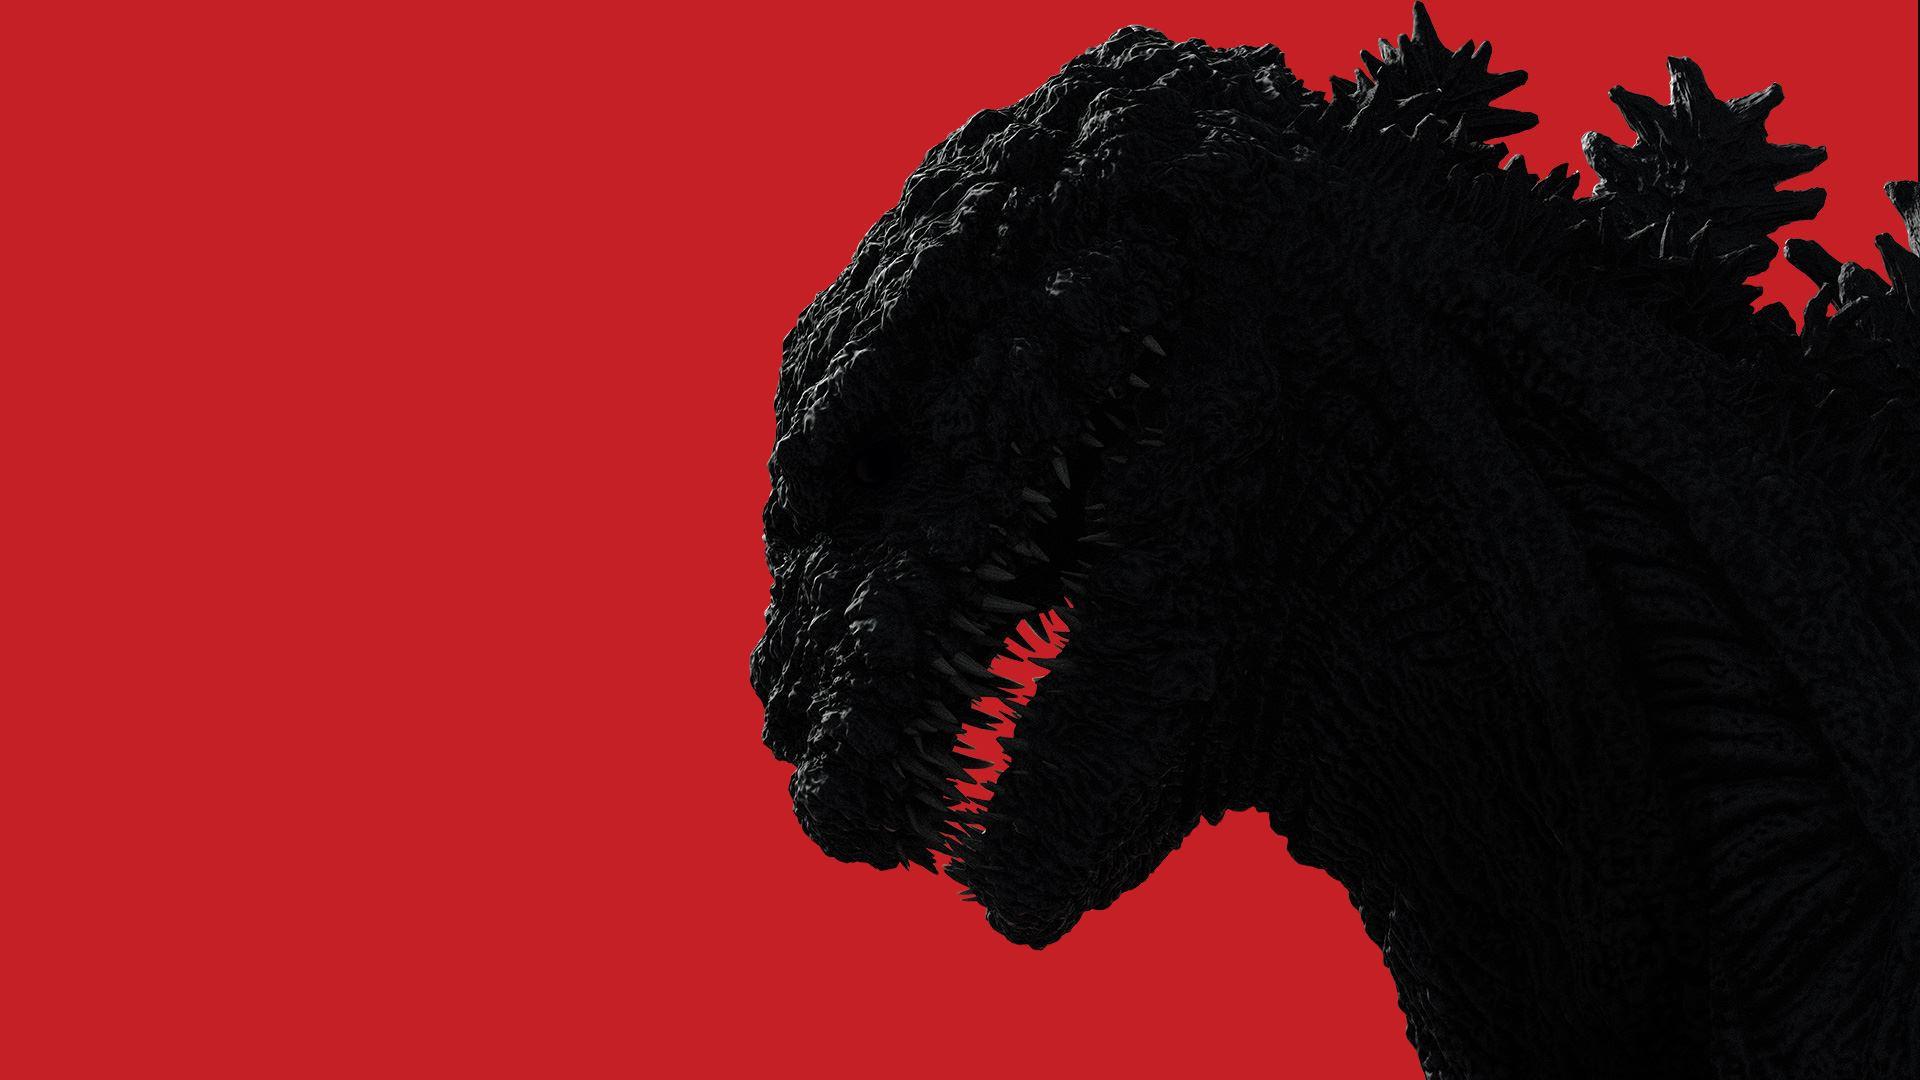 SFM Godzilla vs Wolverine Battle in the Movies Godzilla 1920×1080